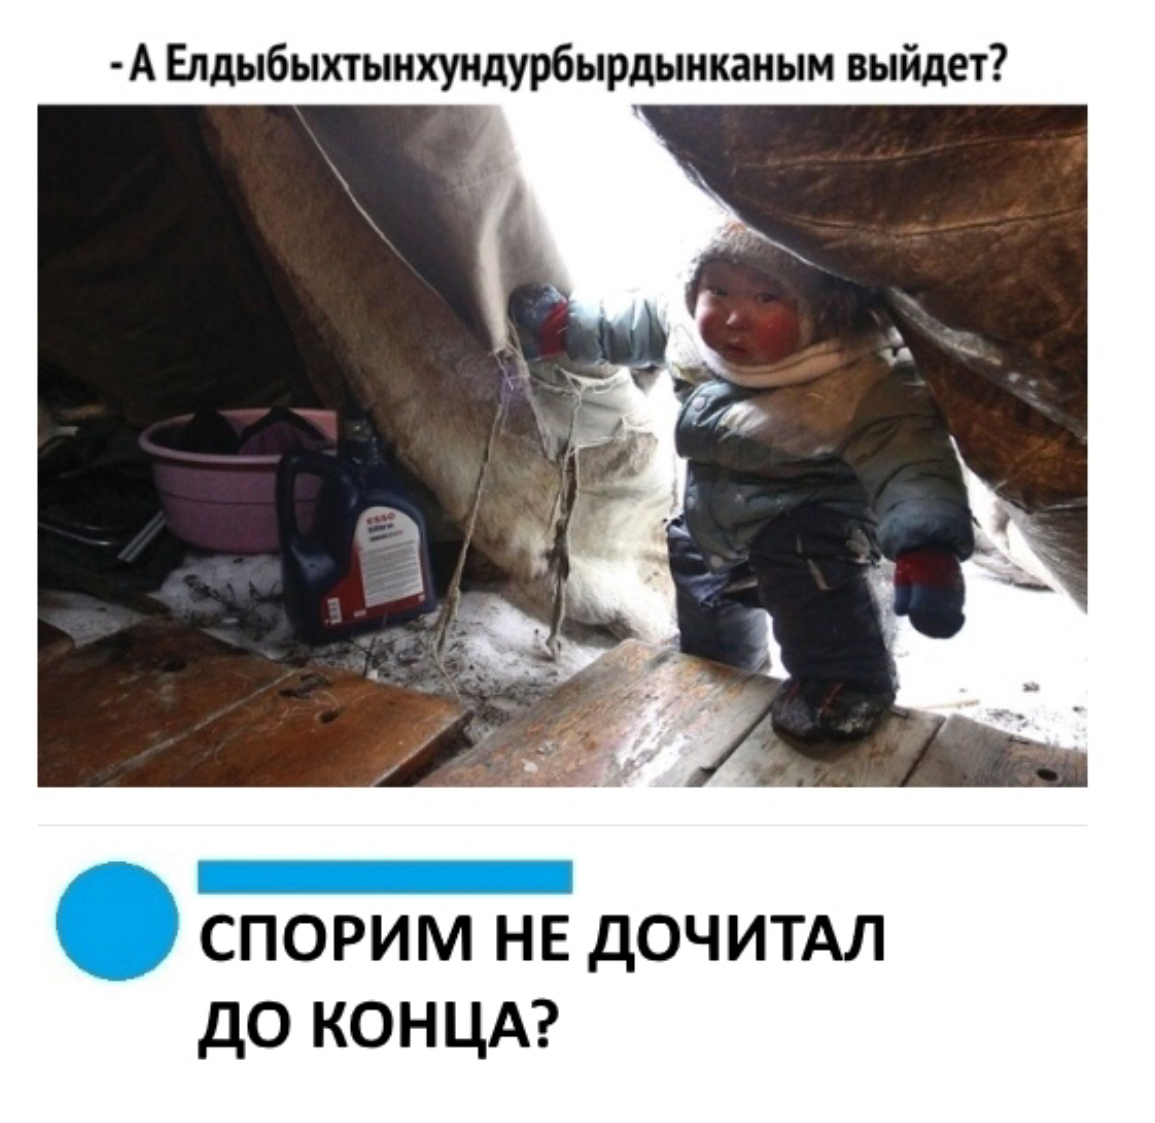 https://i1.imageban.ru/out/2019/04/13/609299e3d693bdea008e317a1f1cdc03.jpg